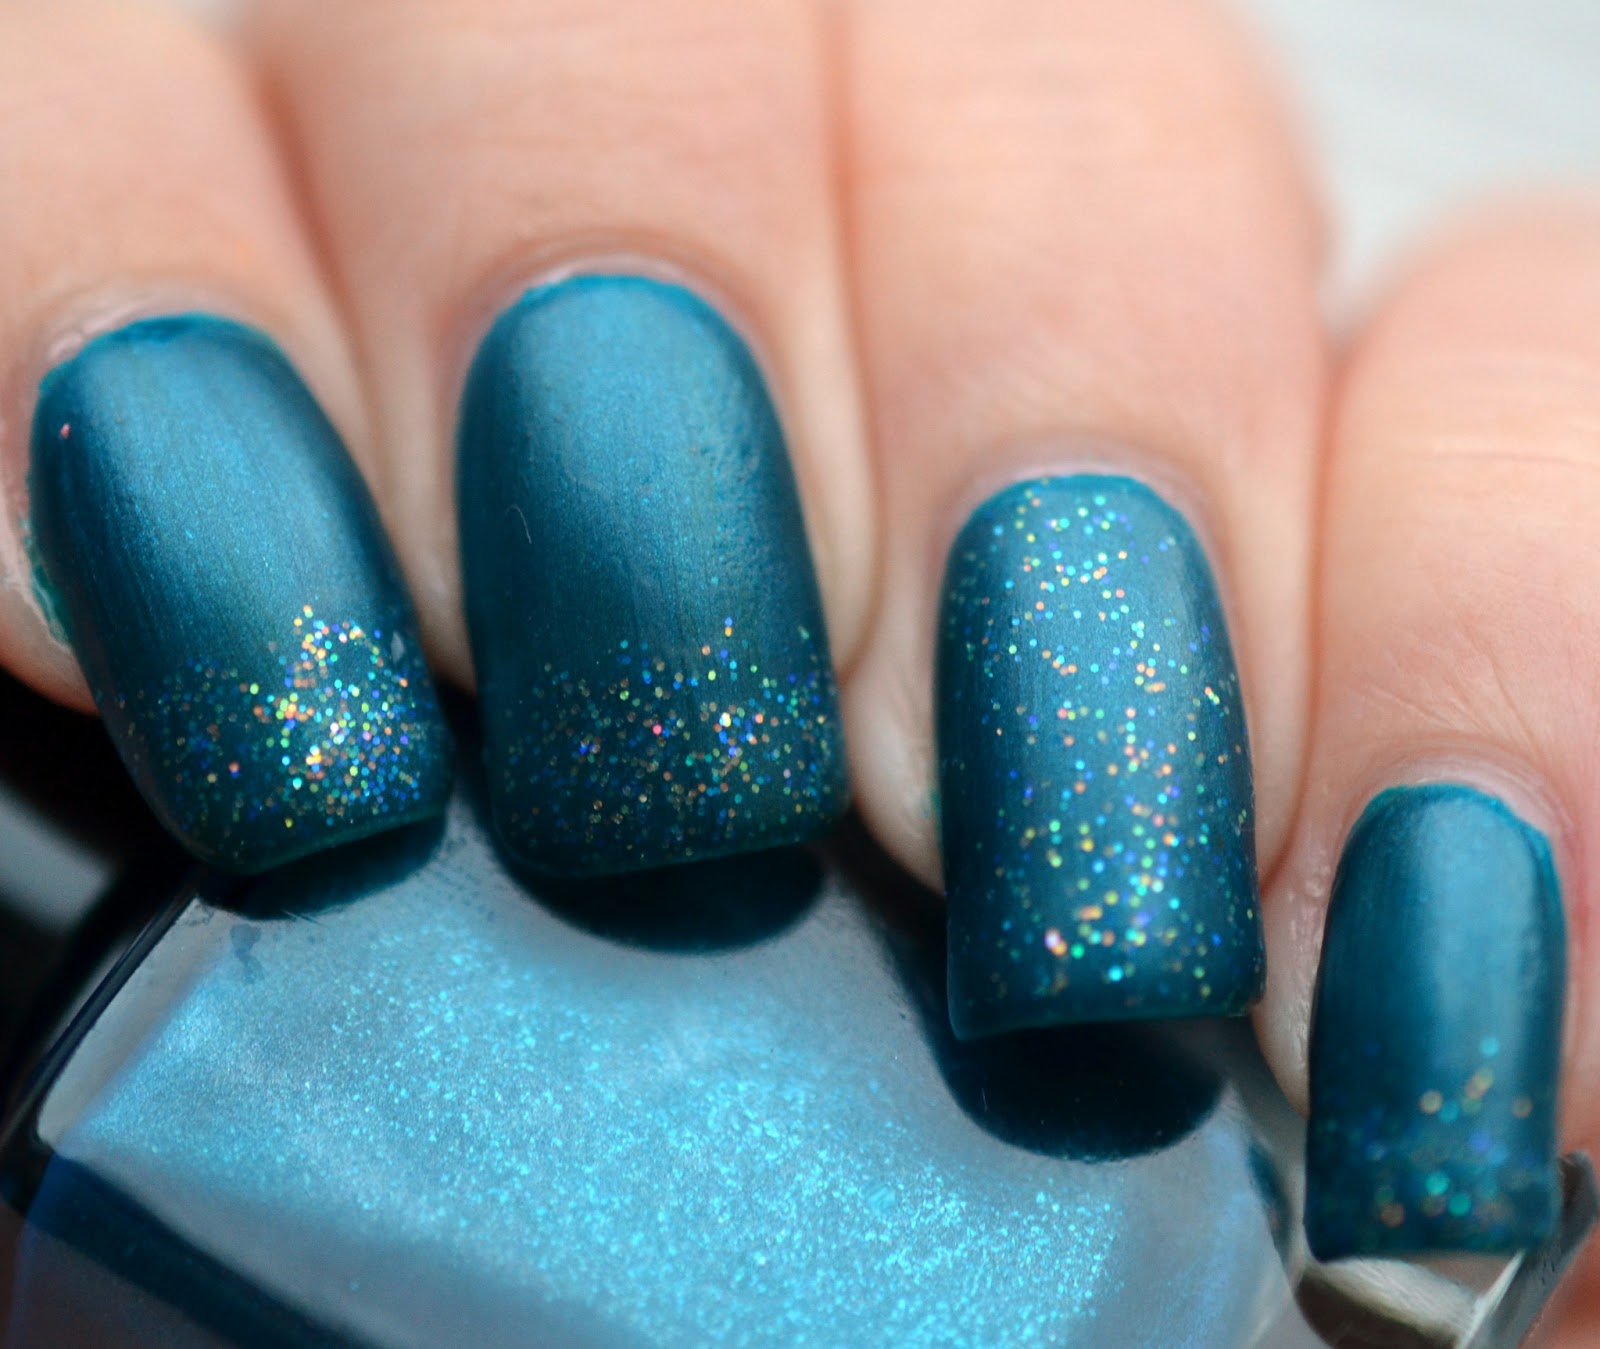 http://lenas-sofa.blogspot.de/2015/01/gina-tricot-76-brilliant-blue.html